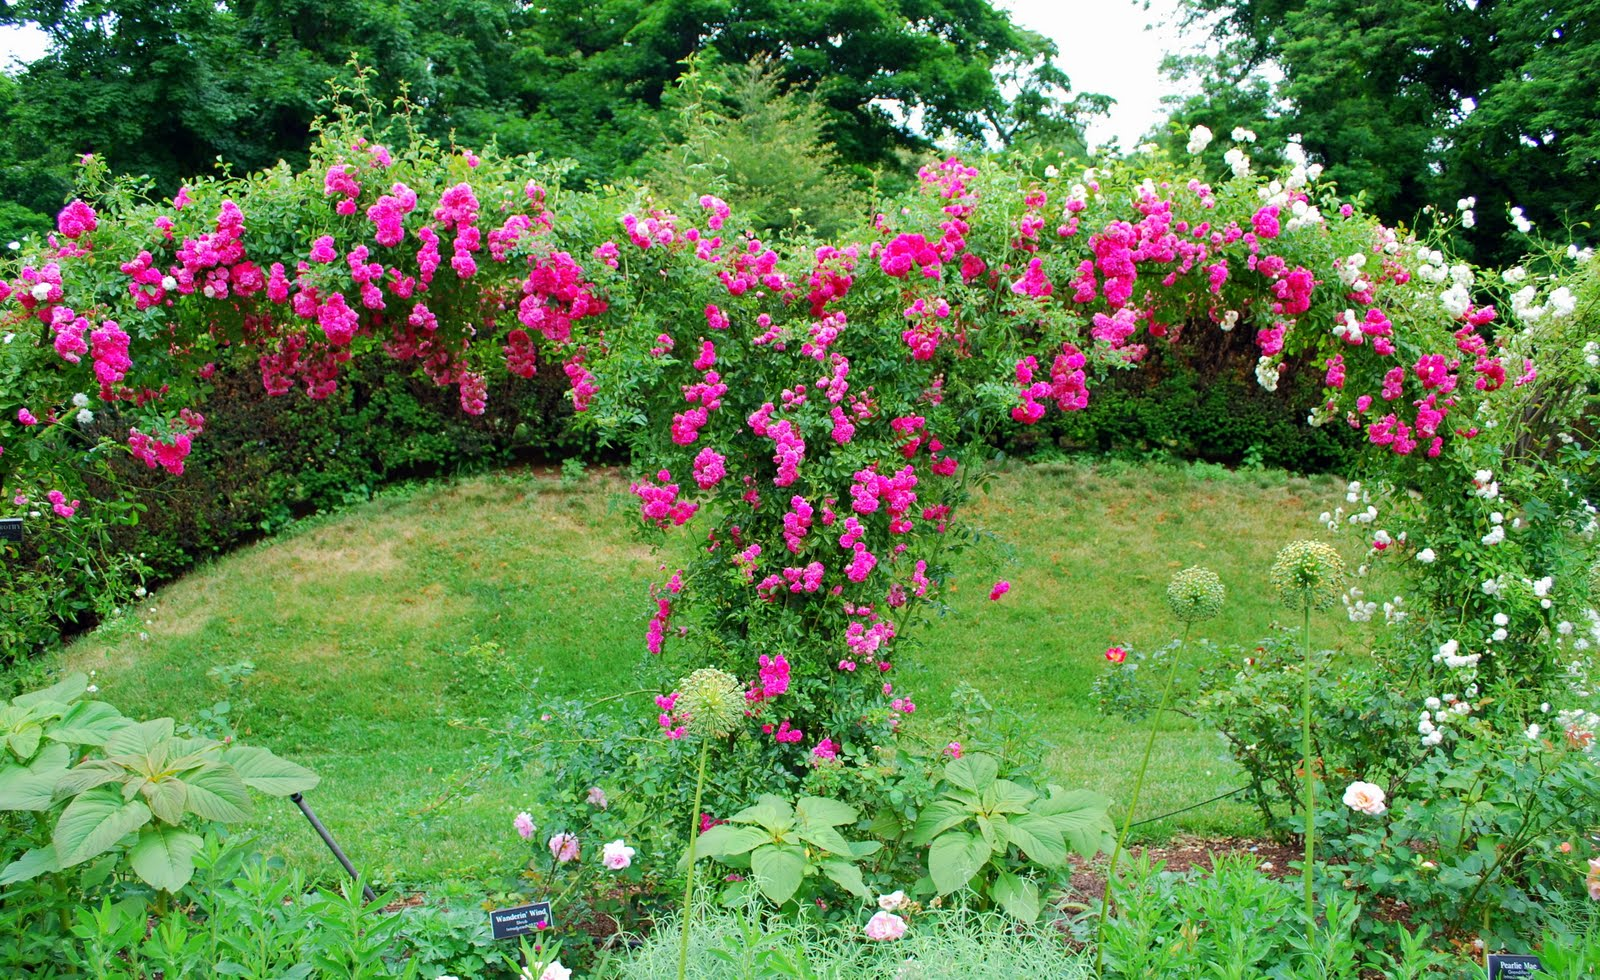 Mille Fiori Favoriti Pink Roses in the Cranford Rose Garden